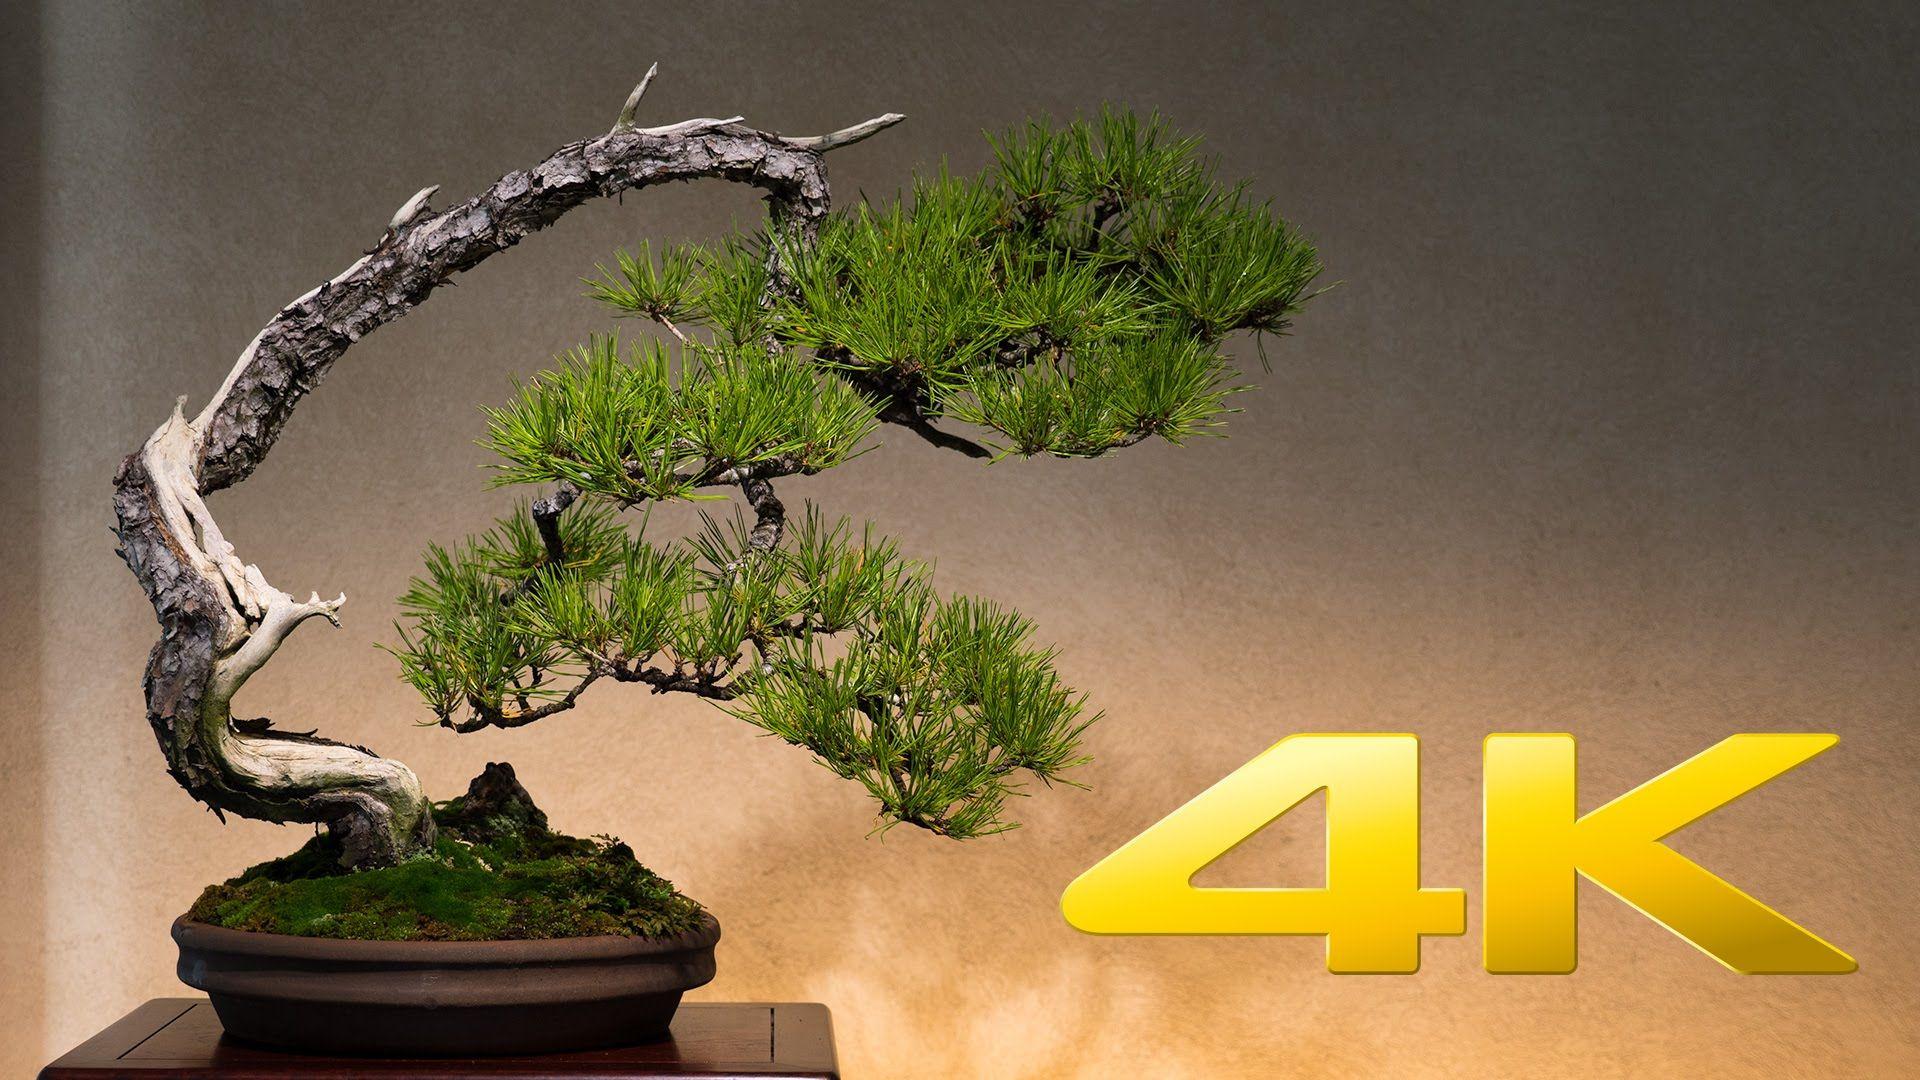 Saitama Omiya Bonsai Museum 大宮盆栽美術館 4k Ultra Hd Bonsai Bonsai Tree Tree Wallpaper 4k